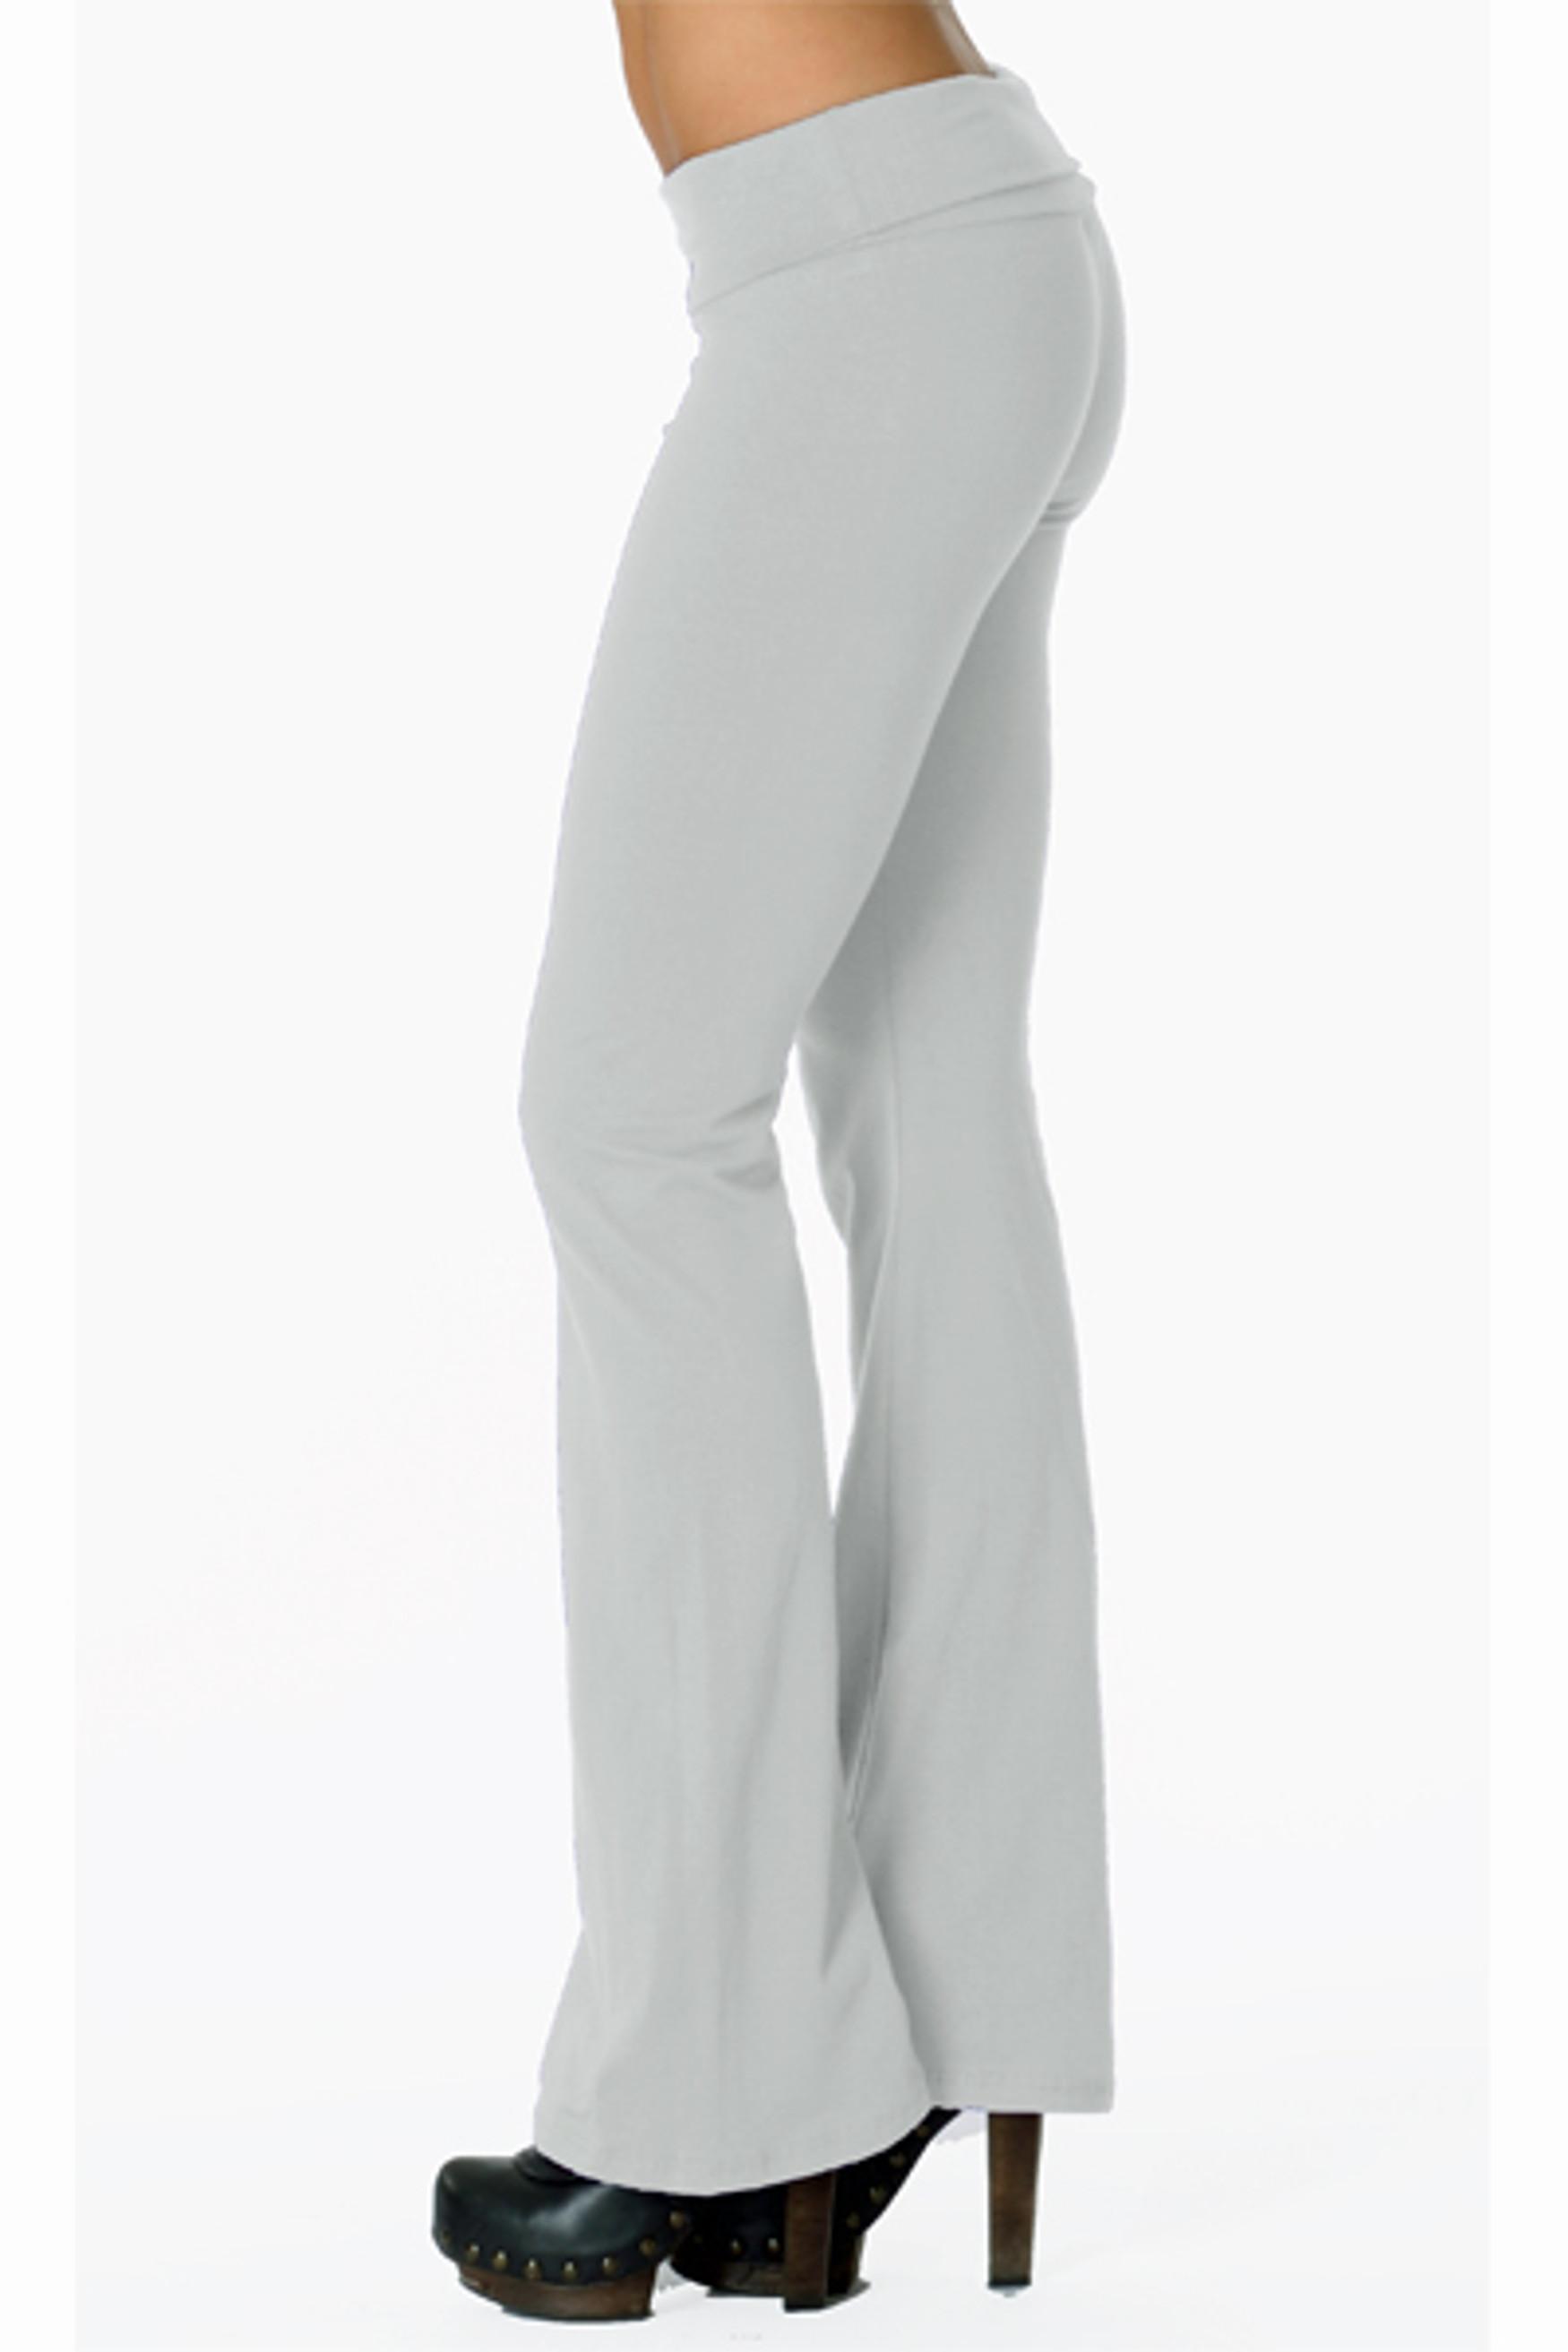 USA Cotton Solid Fold Over Leggings